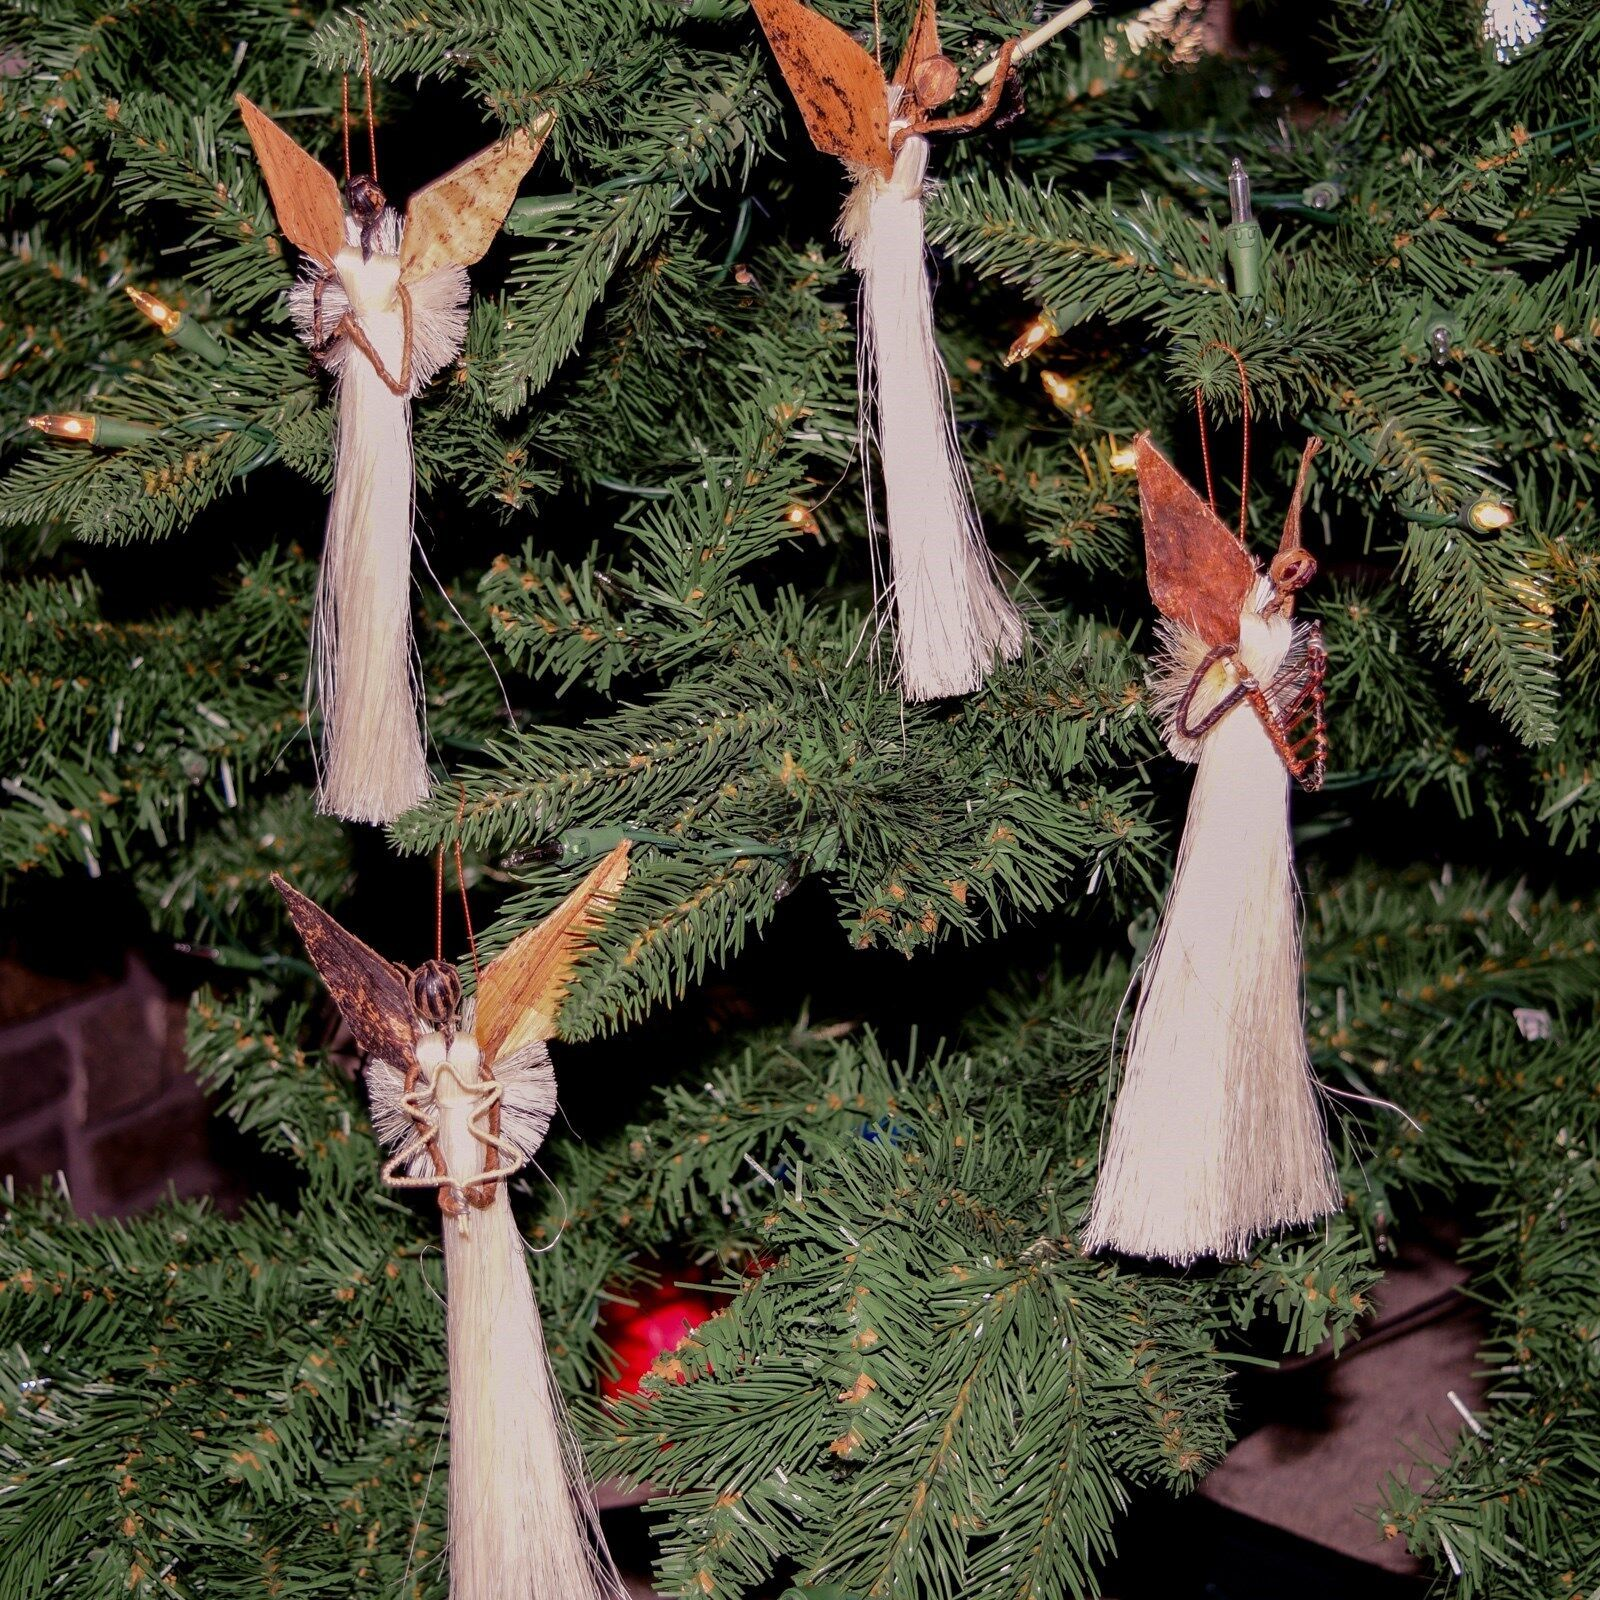 Angel Christmas Ornament Bided  Angel Rustic Ornament Home Decor